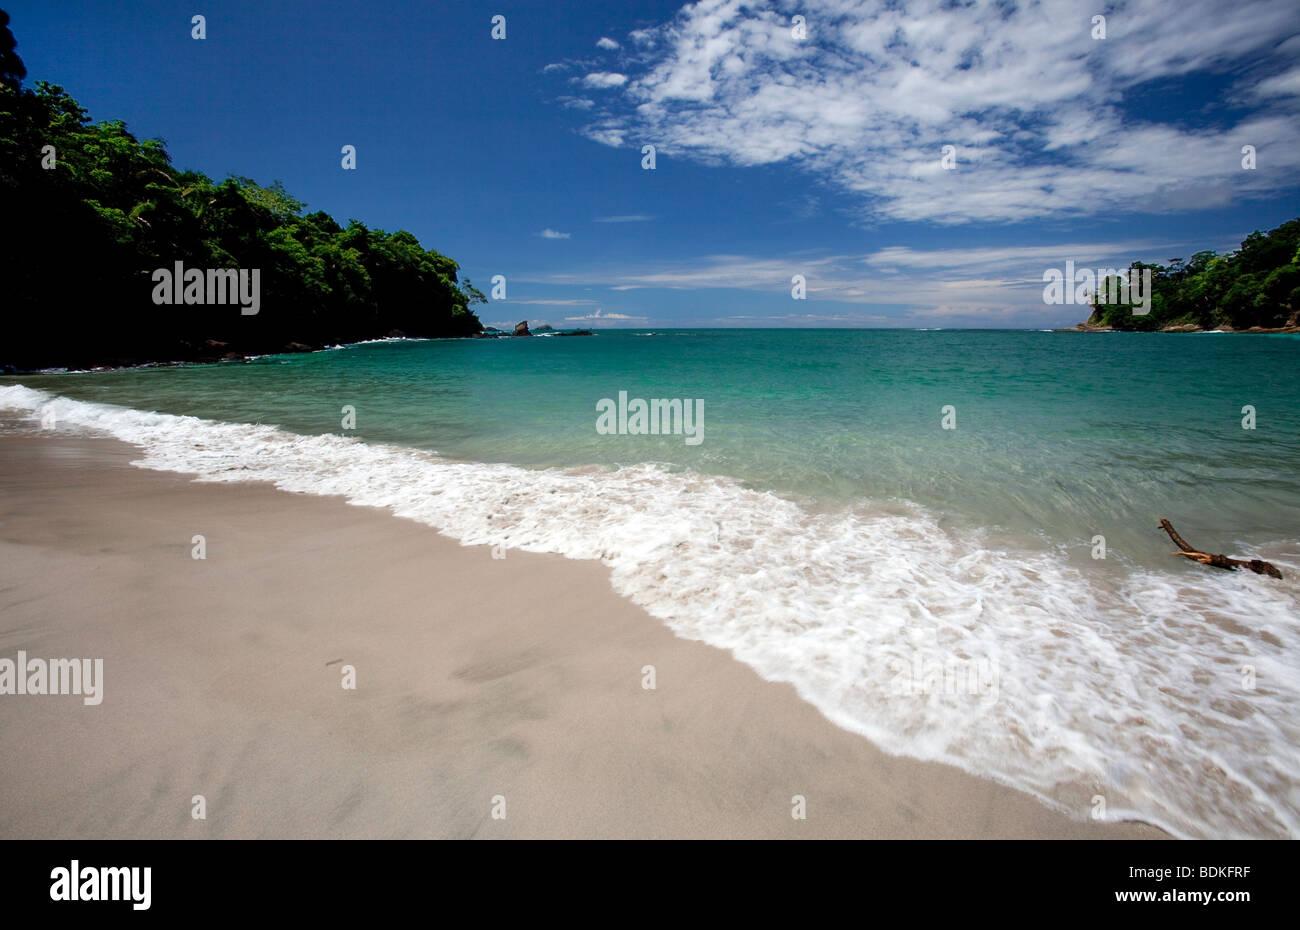 Tropical Beach in Costa Rica - Stock Image